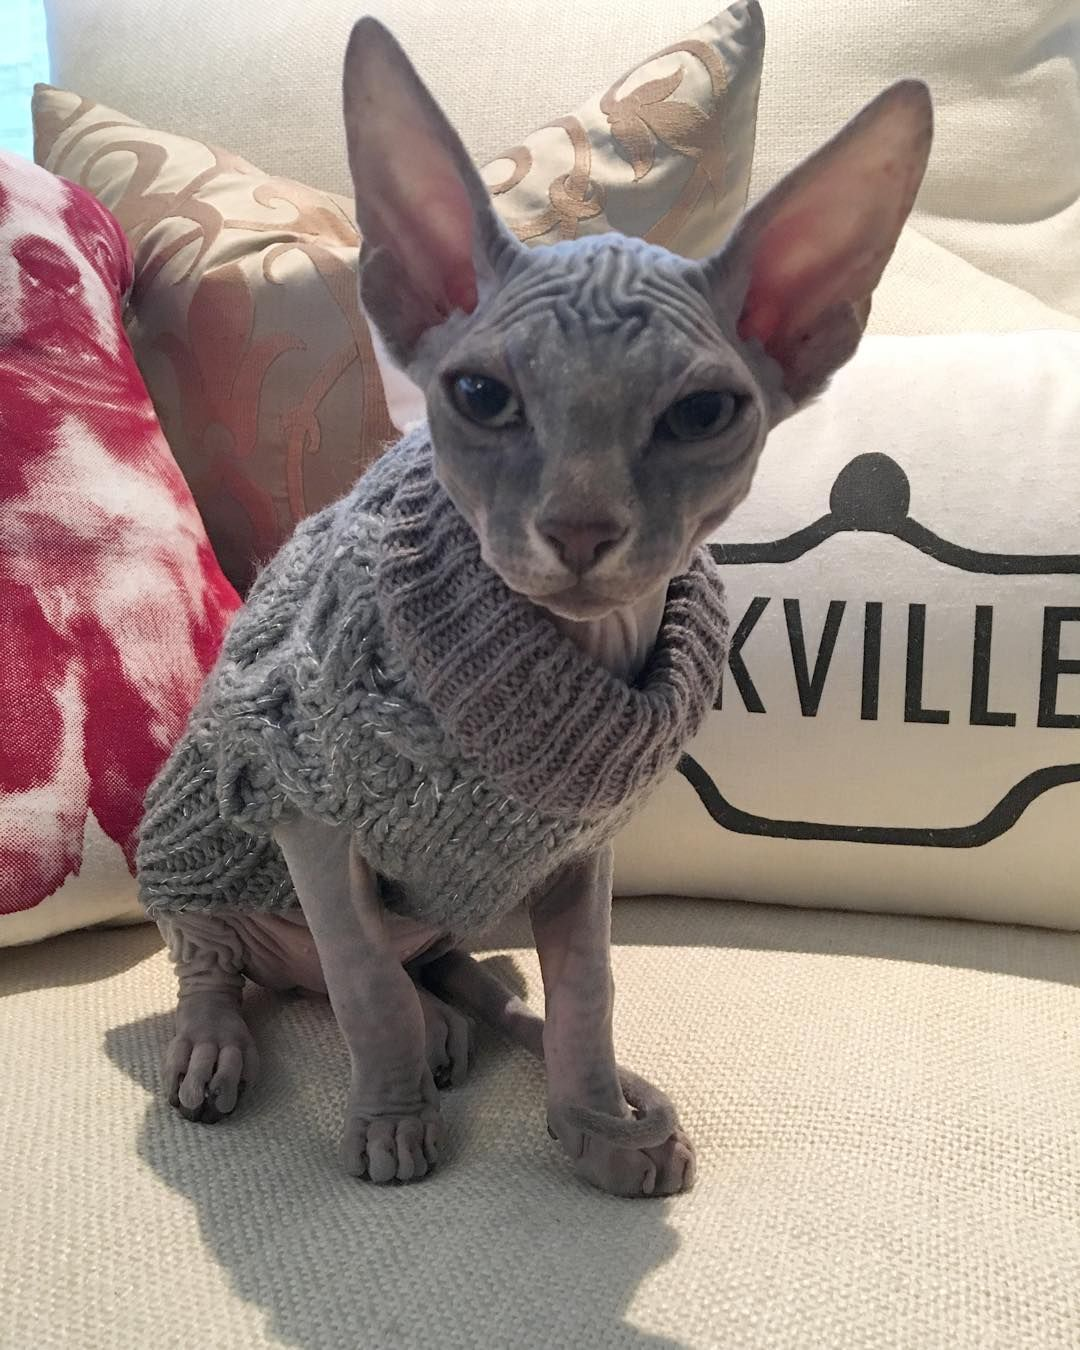 50 shades of Sphynx Sphynx cat, Hairless cat, Rex cat